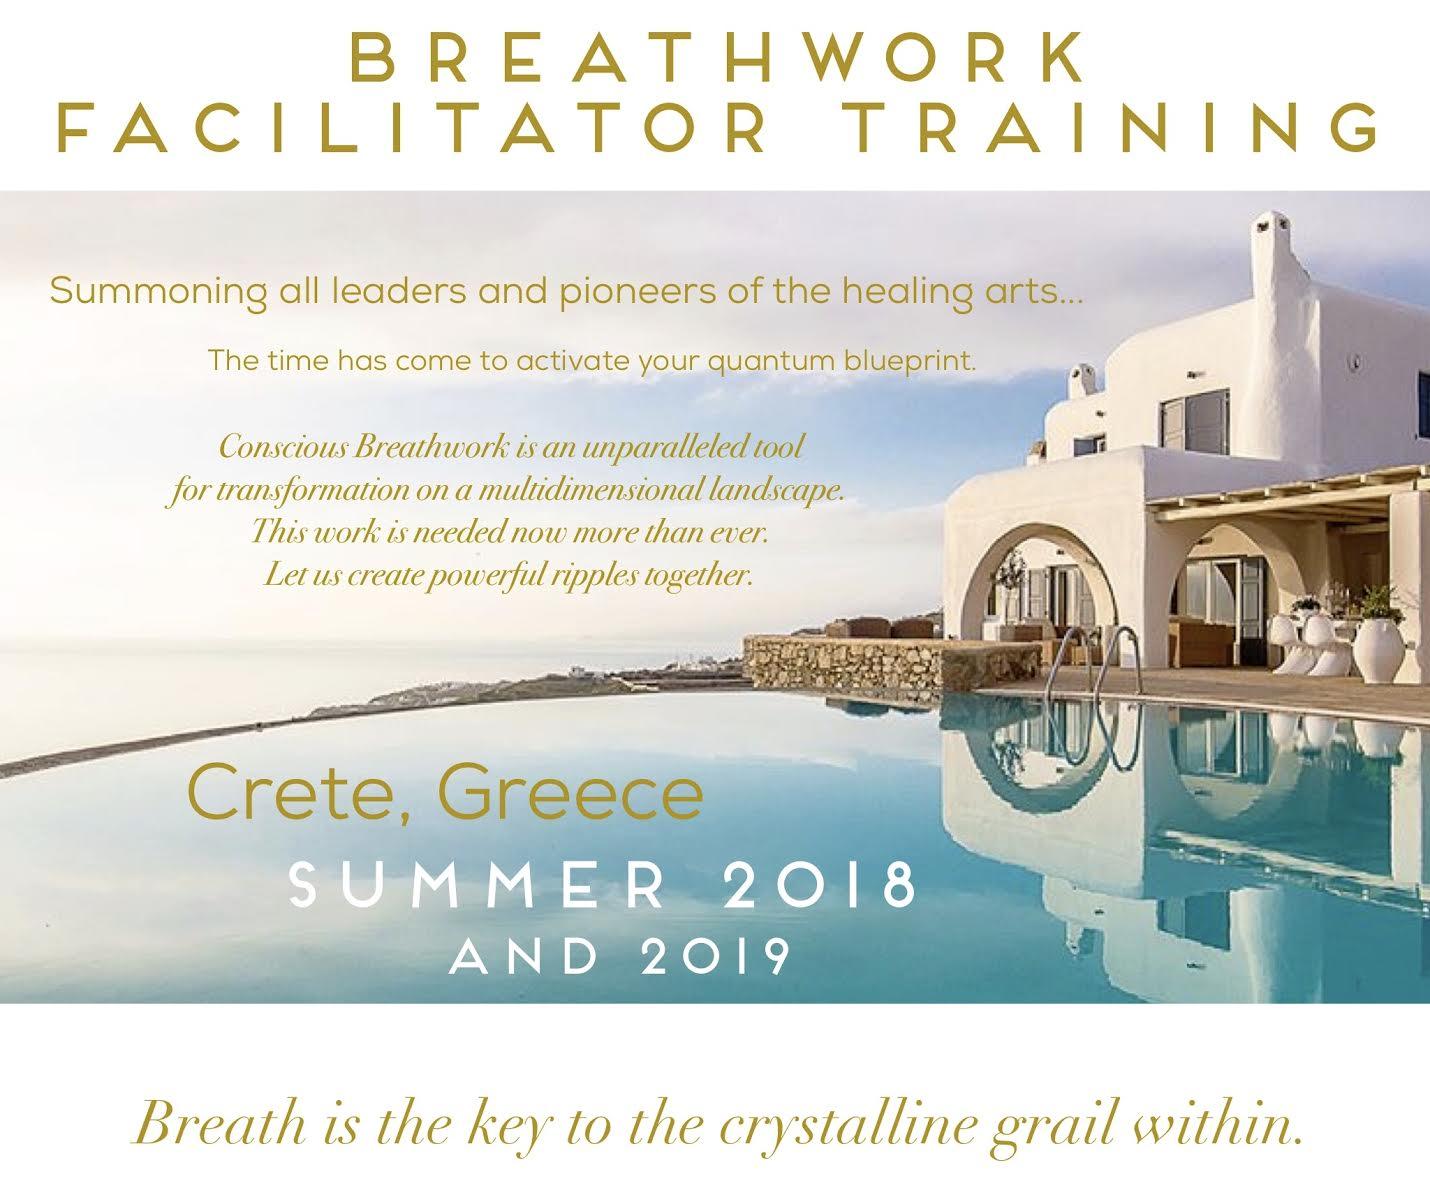 breathworktraining